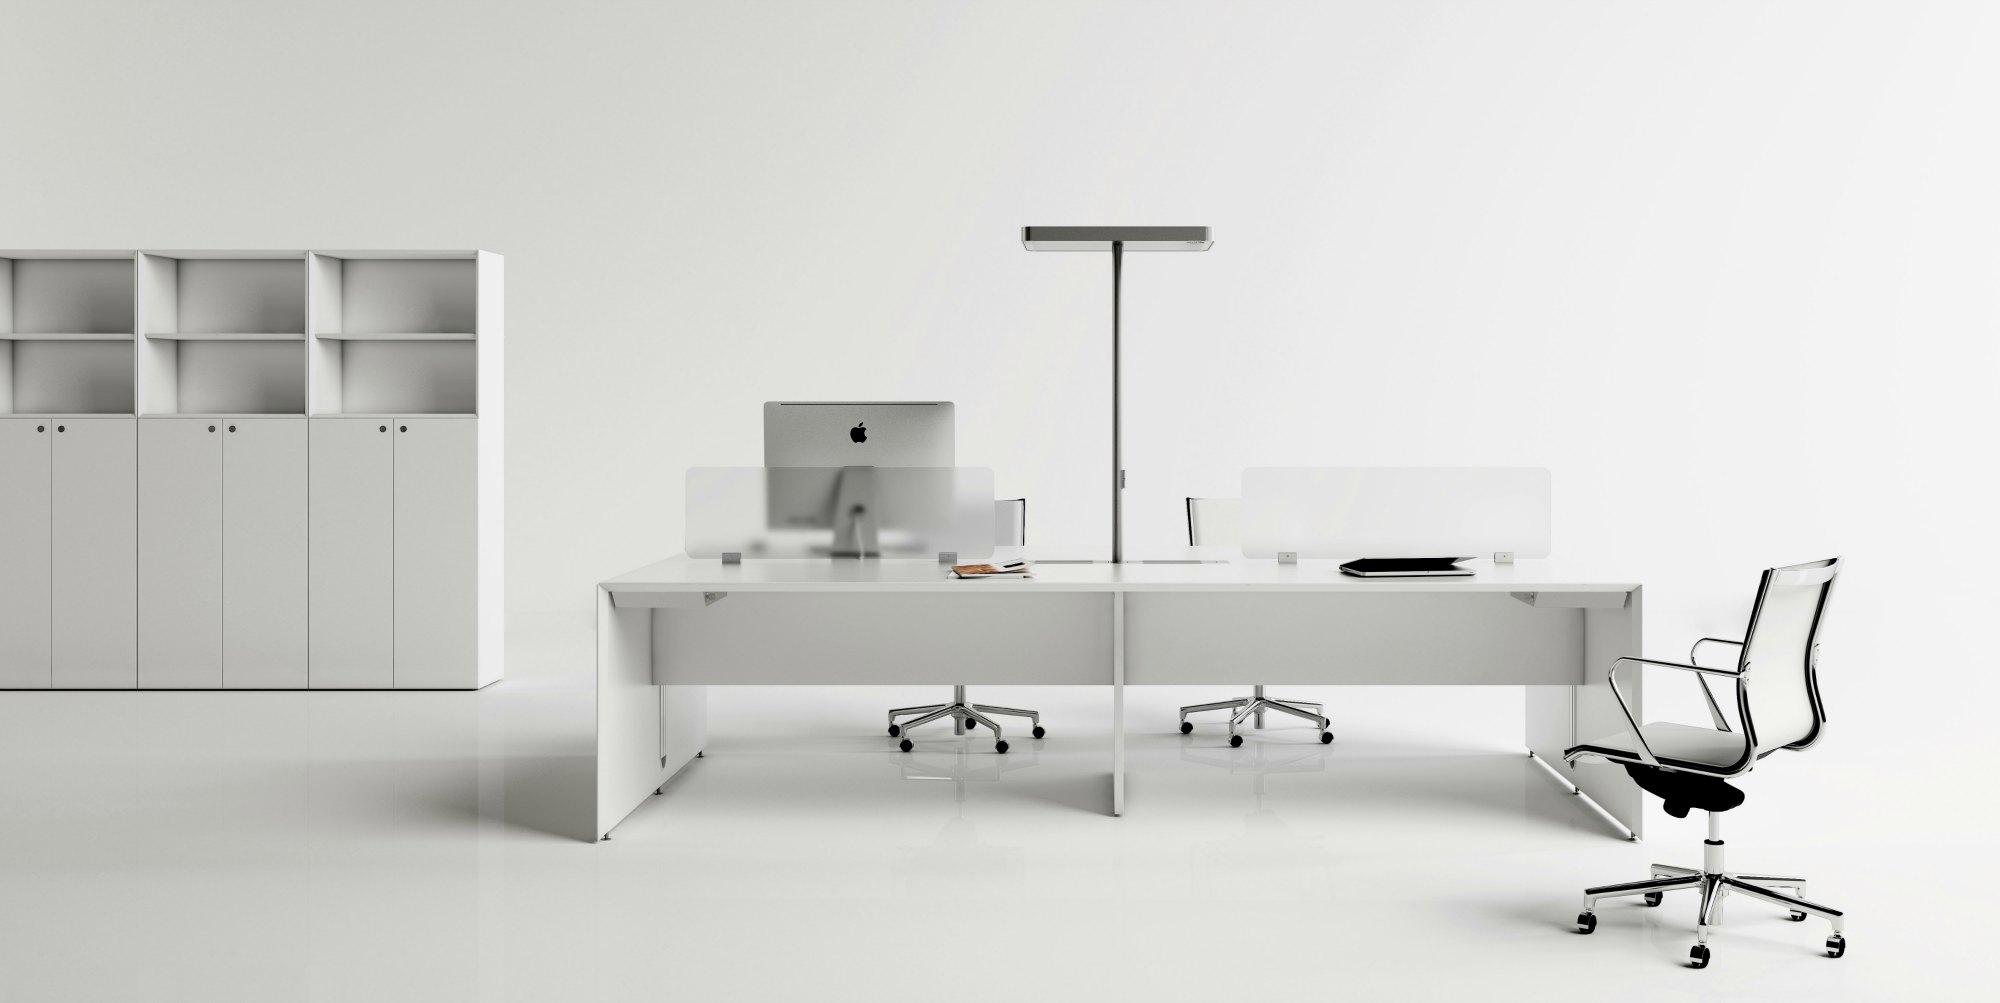 Mobiliario de oficina y archivo adeyaka bcn for Oficinas kutxa barcelona